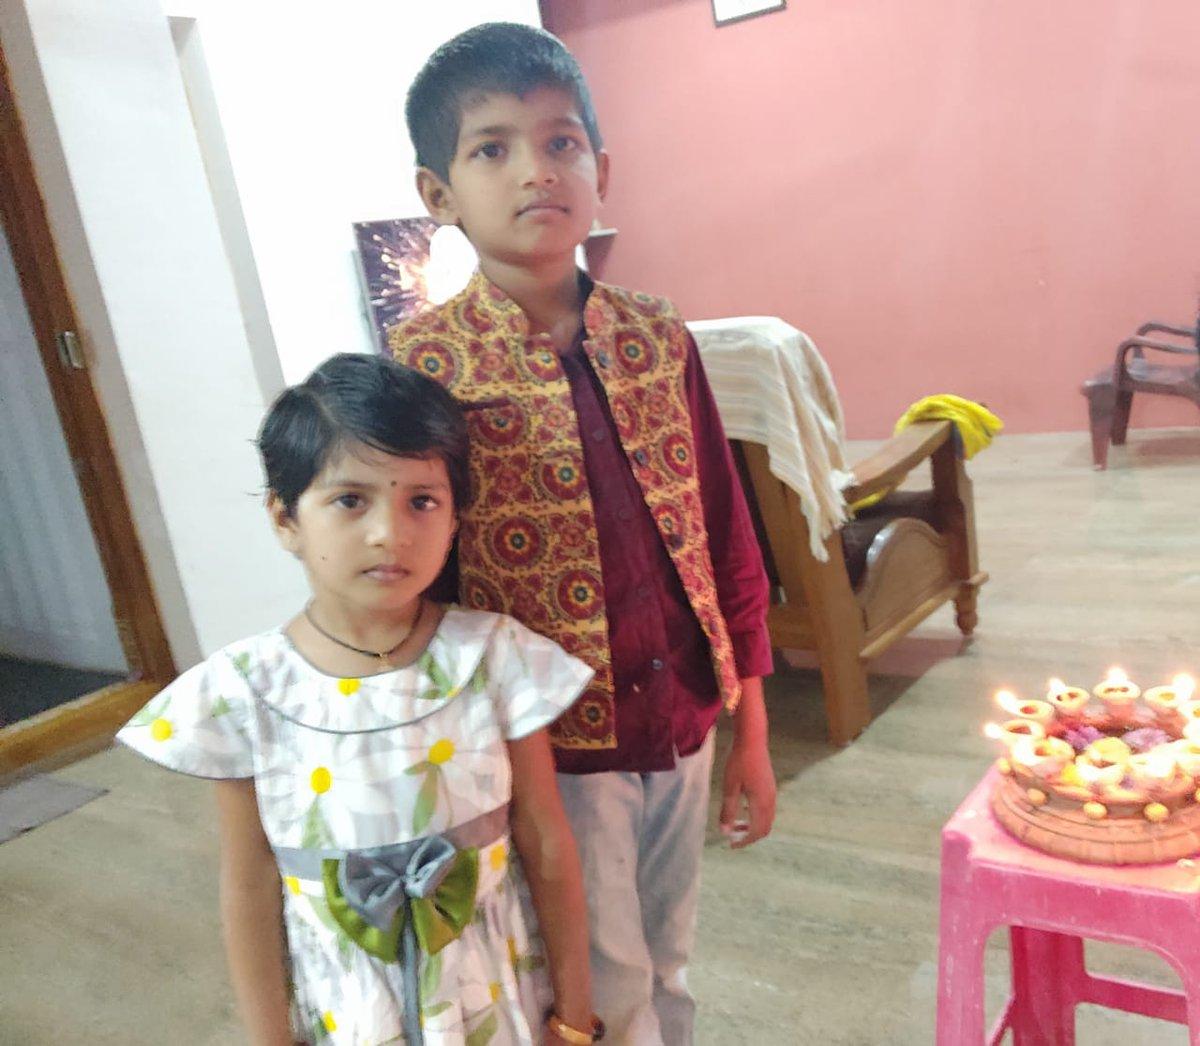 Diwali and Children's Day Celebration.  #Diwali #HappyDiwali #SafeDiwali #Diwali2020 #ChildrensDay #ChildrensDaySpecial #ChildrensDay2020 #ChildrensDayContest